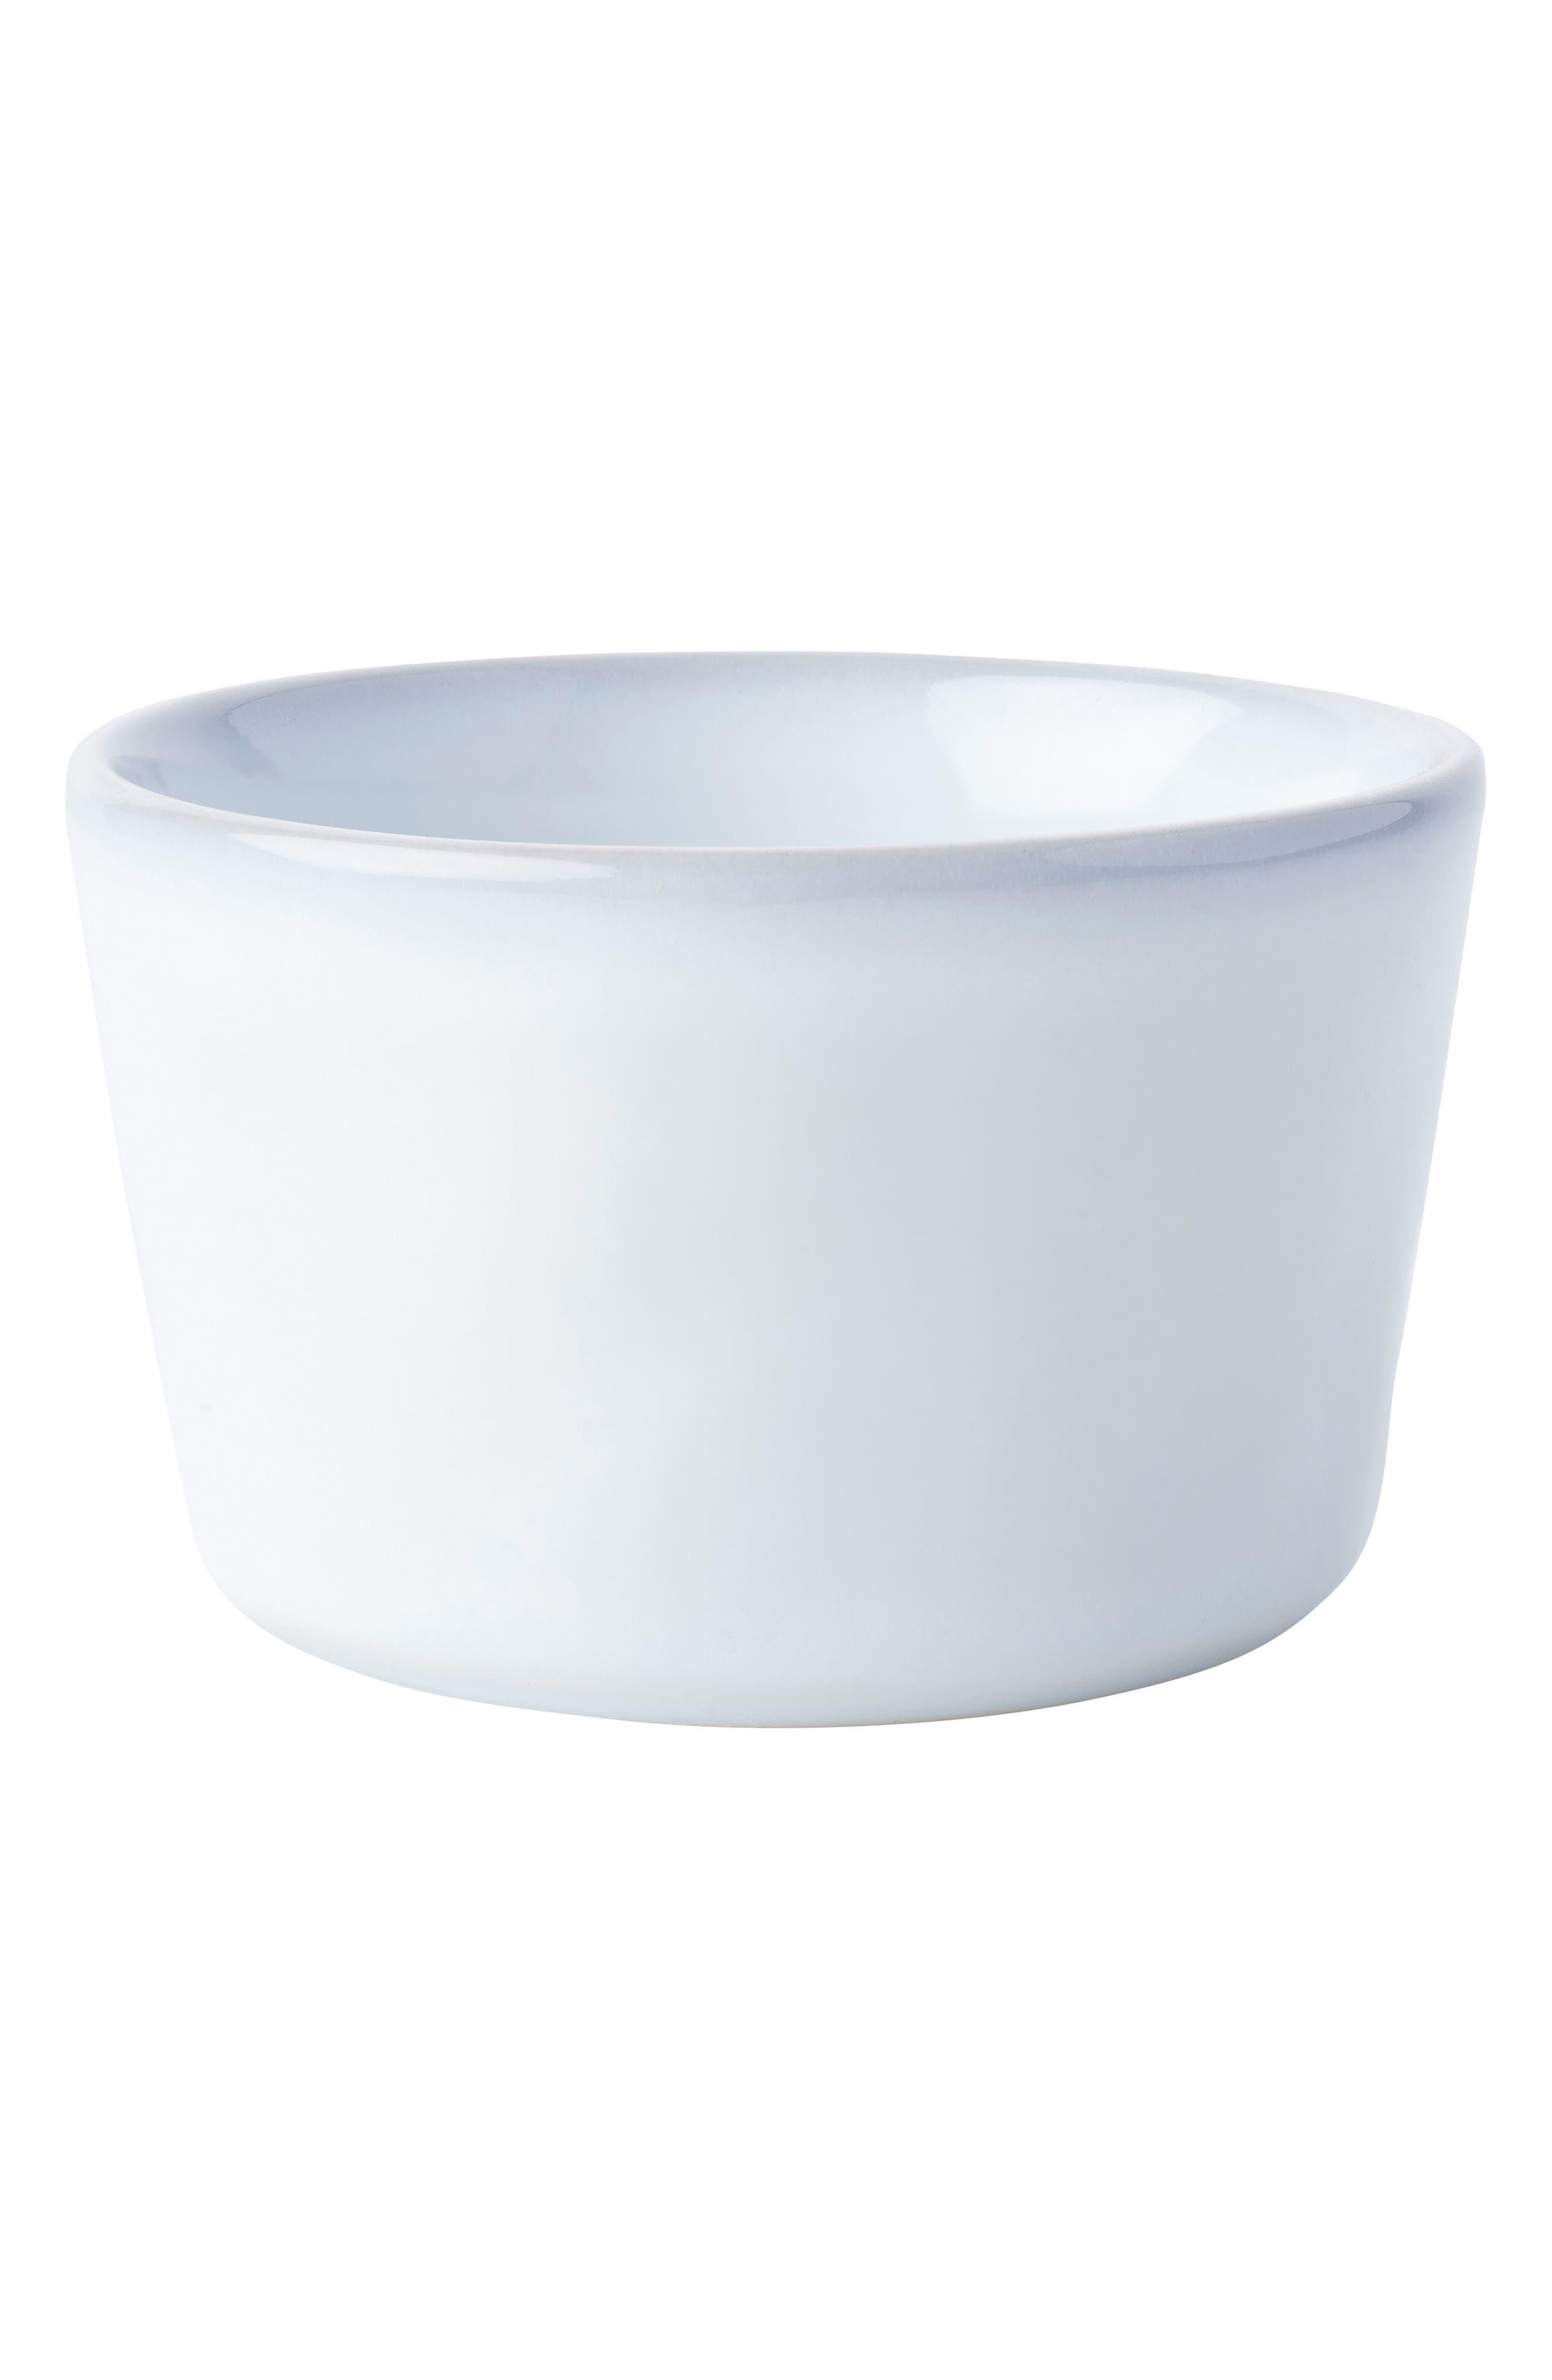 Quotidien White Truffle Ceramic Ramekin,                         Main,                         color, White Truffle